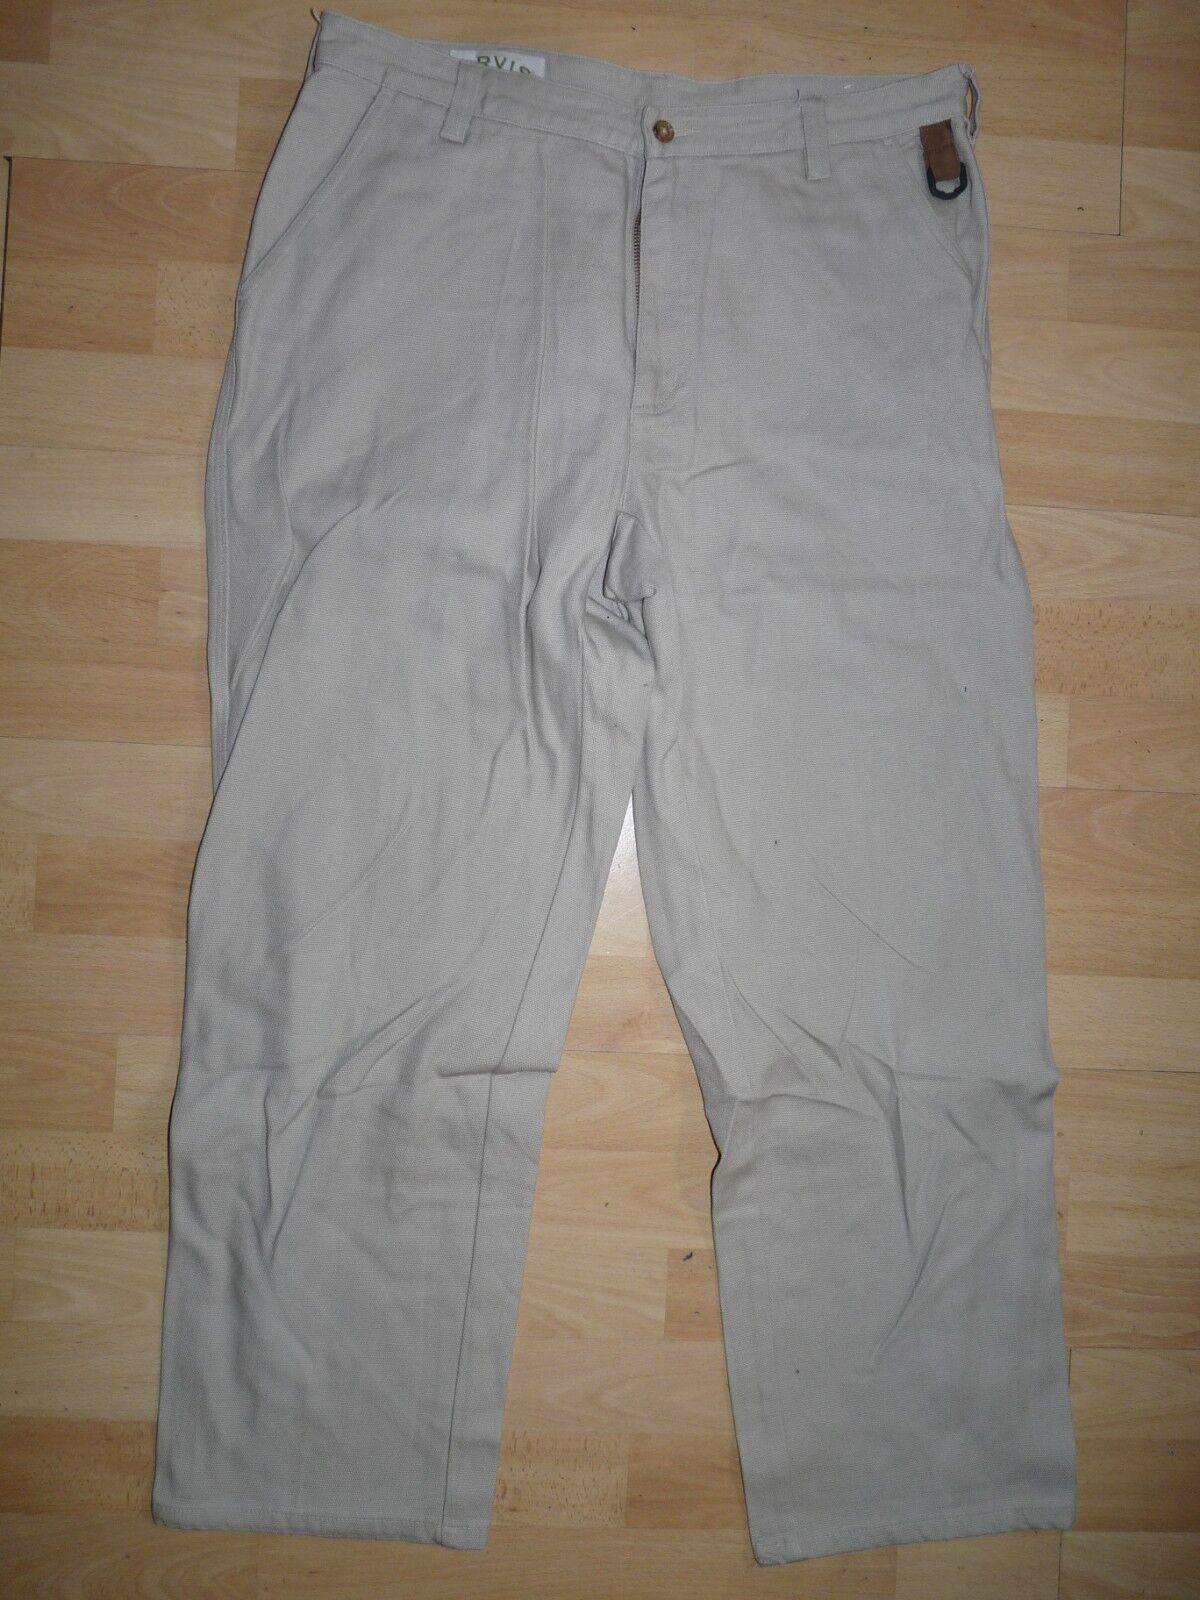 Original ORVIS Rhinohide men's canvas fishing trousers field cotton pants W34 04